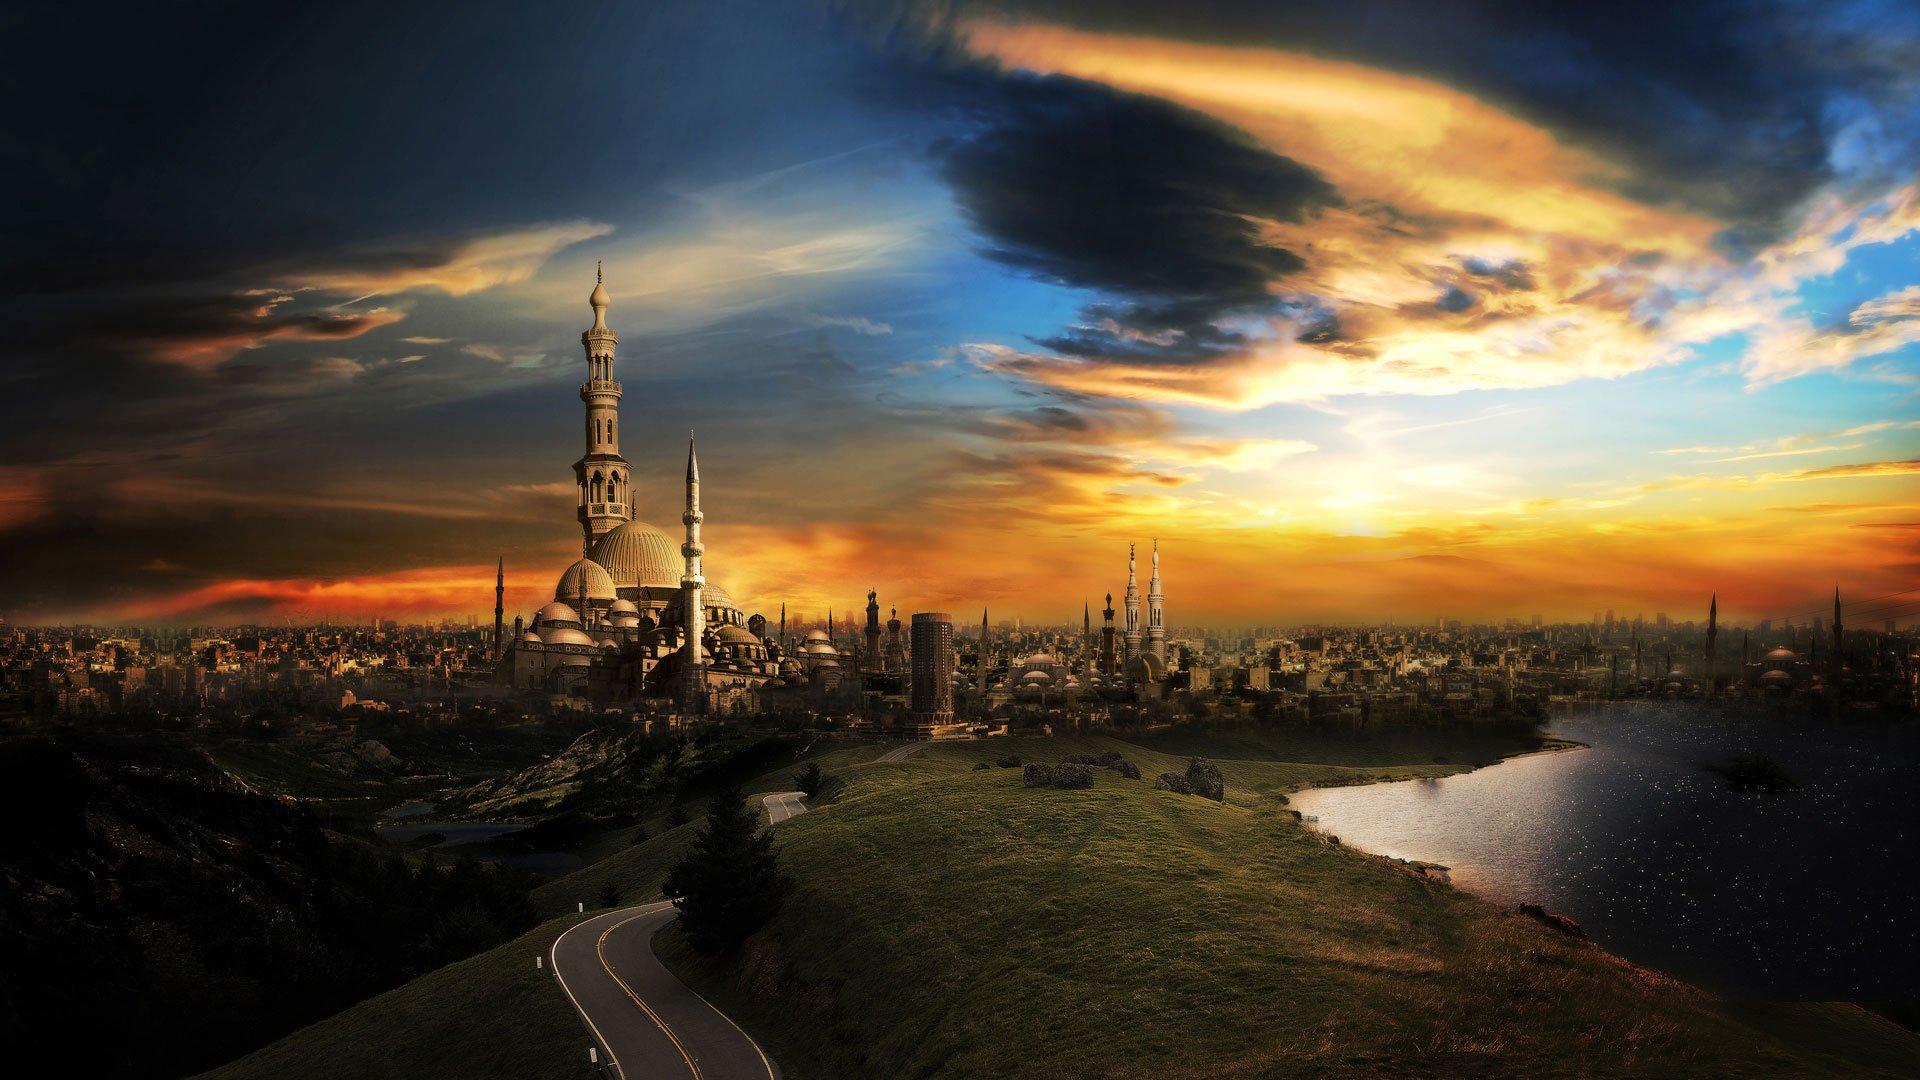 Man Made - City  CGI Landscape Cloud Sky Sunset Lake Road Islam Wallpaper